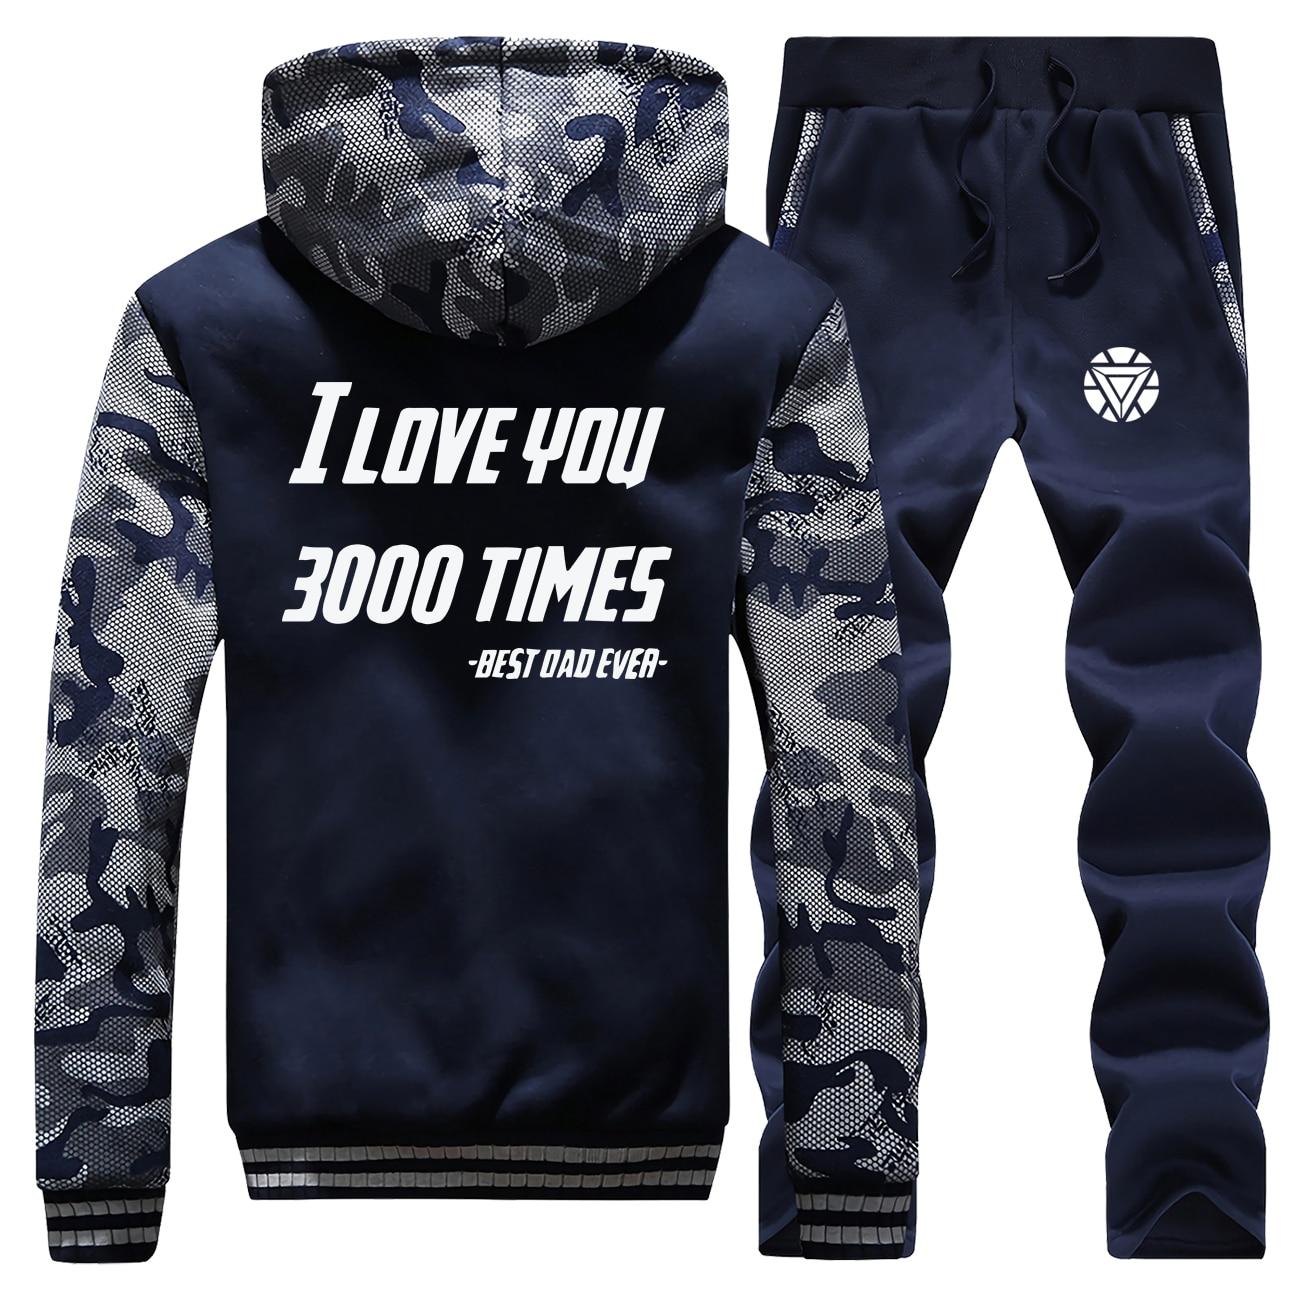 Avengers Iron Man I Love You 3000 Times Mens Tracksuit Winter Men Warm Set Thick Jackets+Pants 2 Pieces Sets Male Hoodies Suit